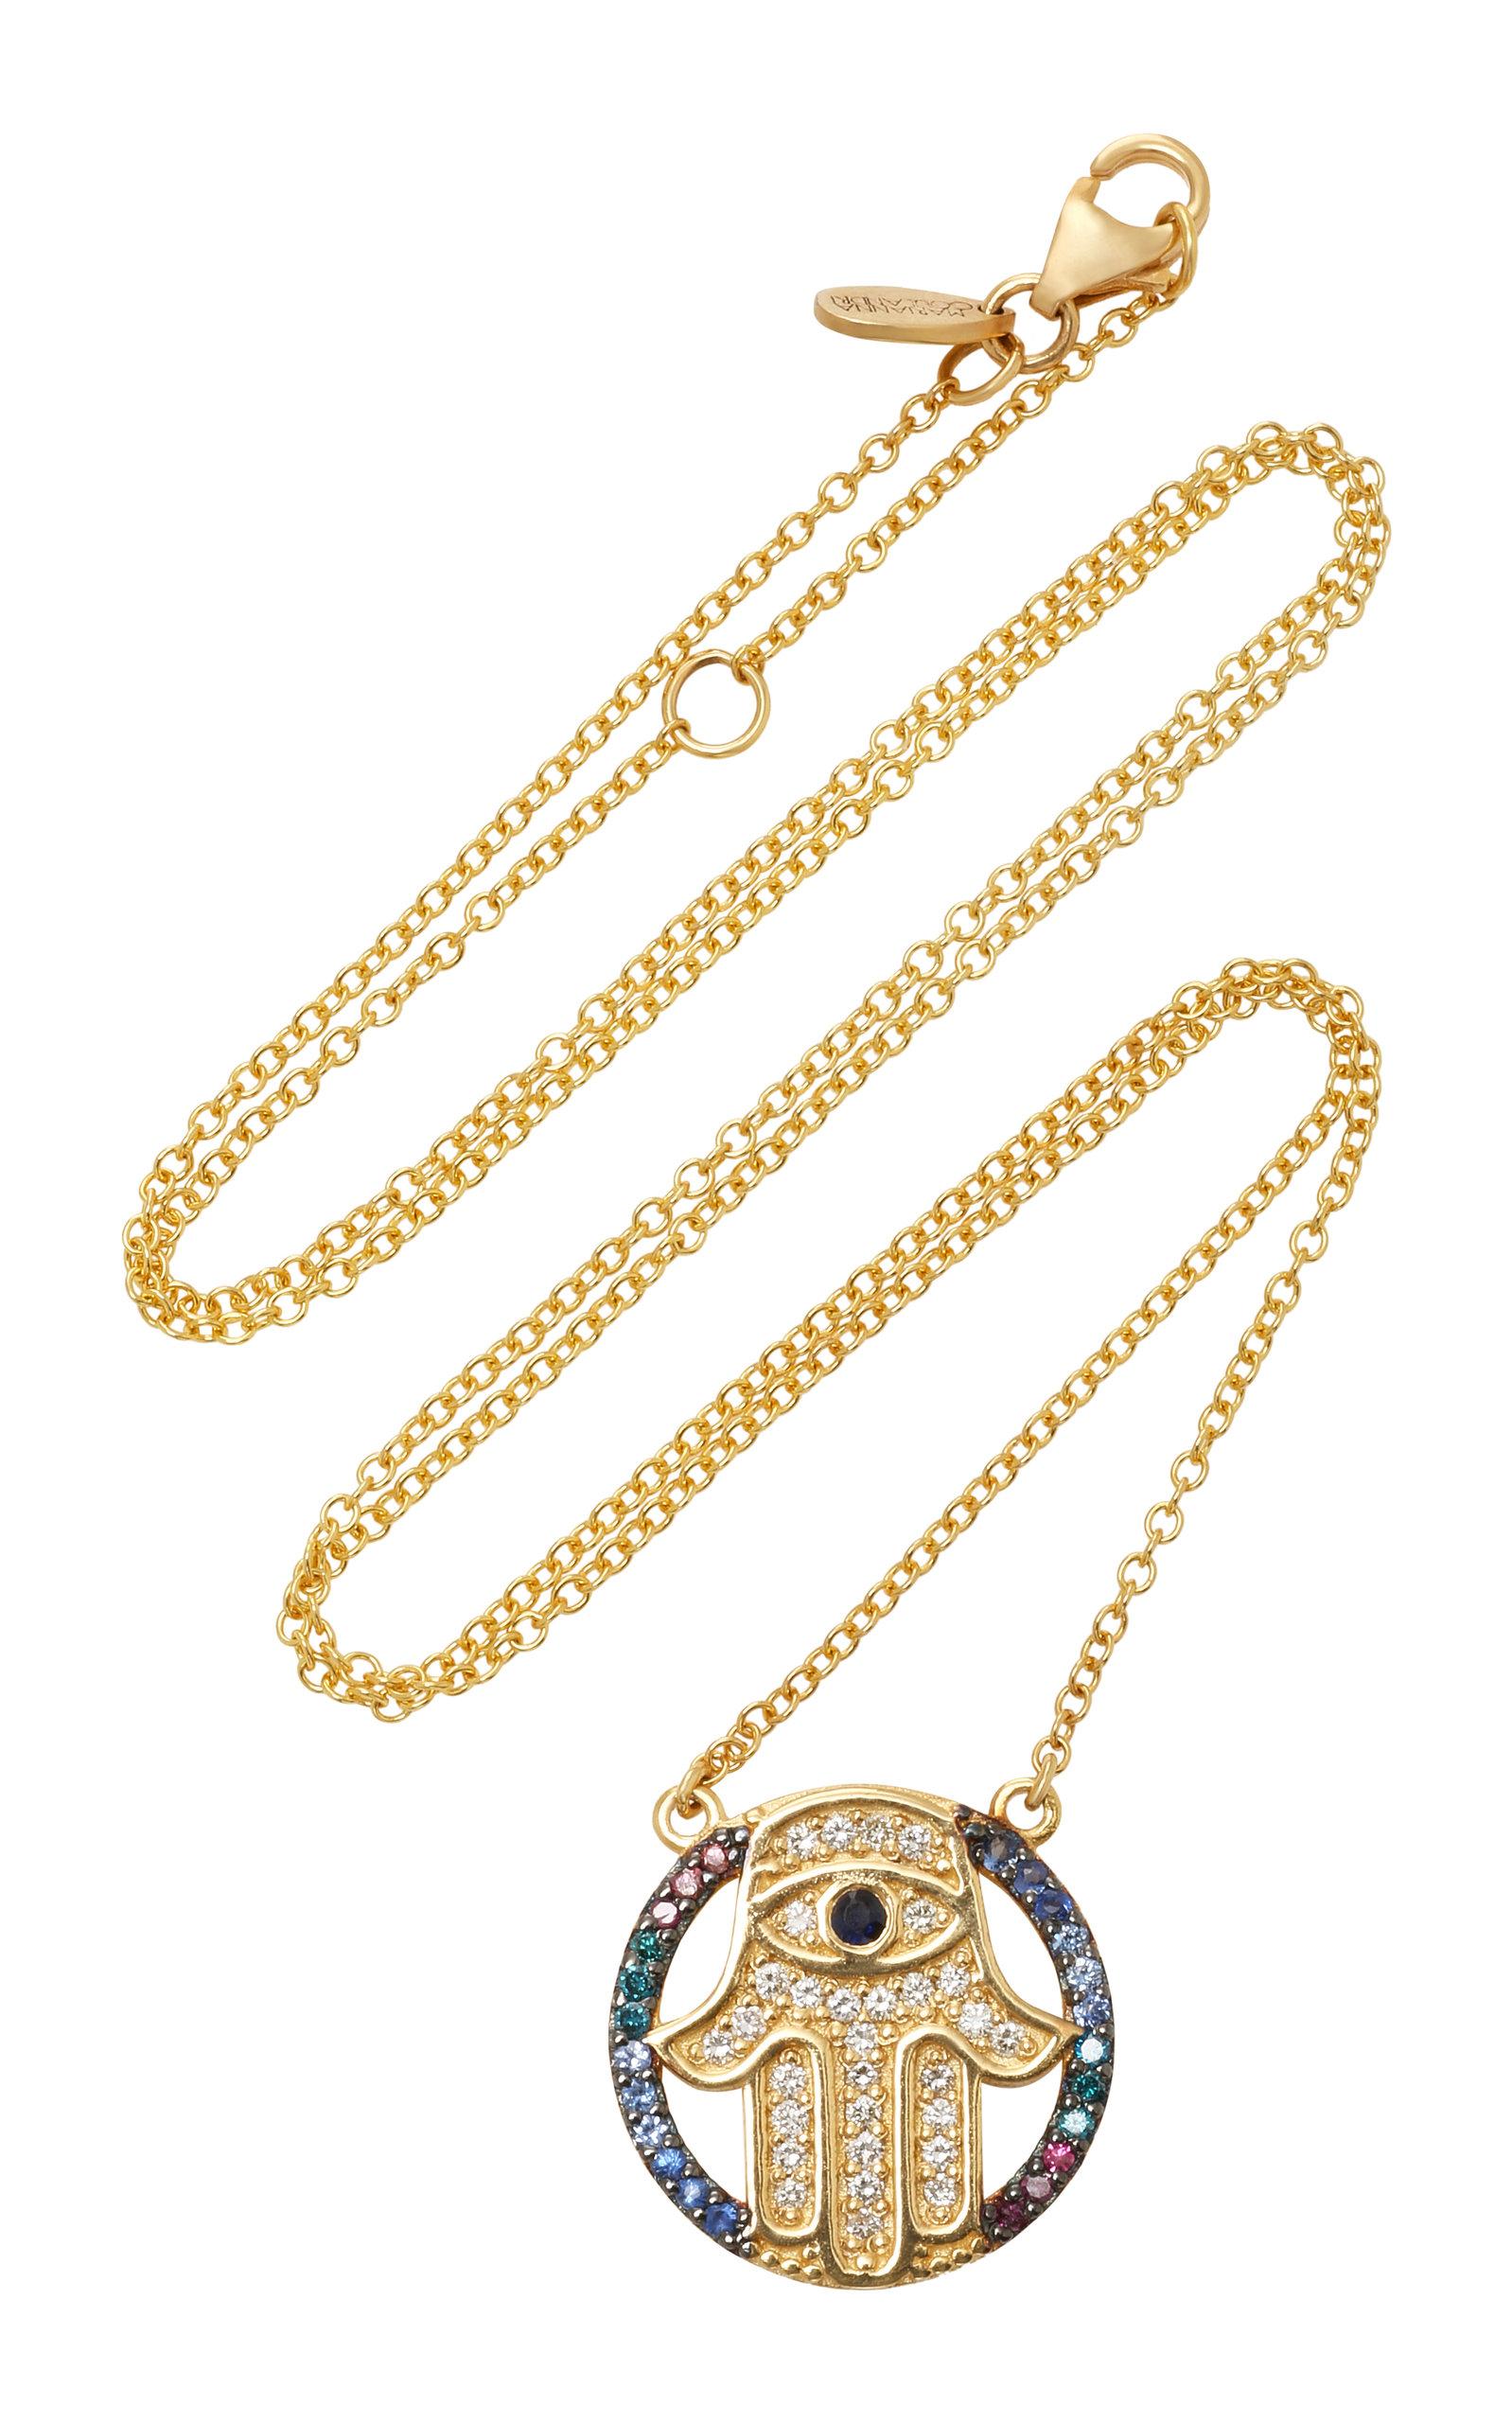 MARIANNA GOULANDRIS MINI HAMZA 14K GOLD DIAMOND AND SAPPHIRE NECKLACE